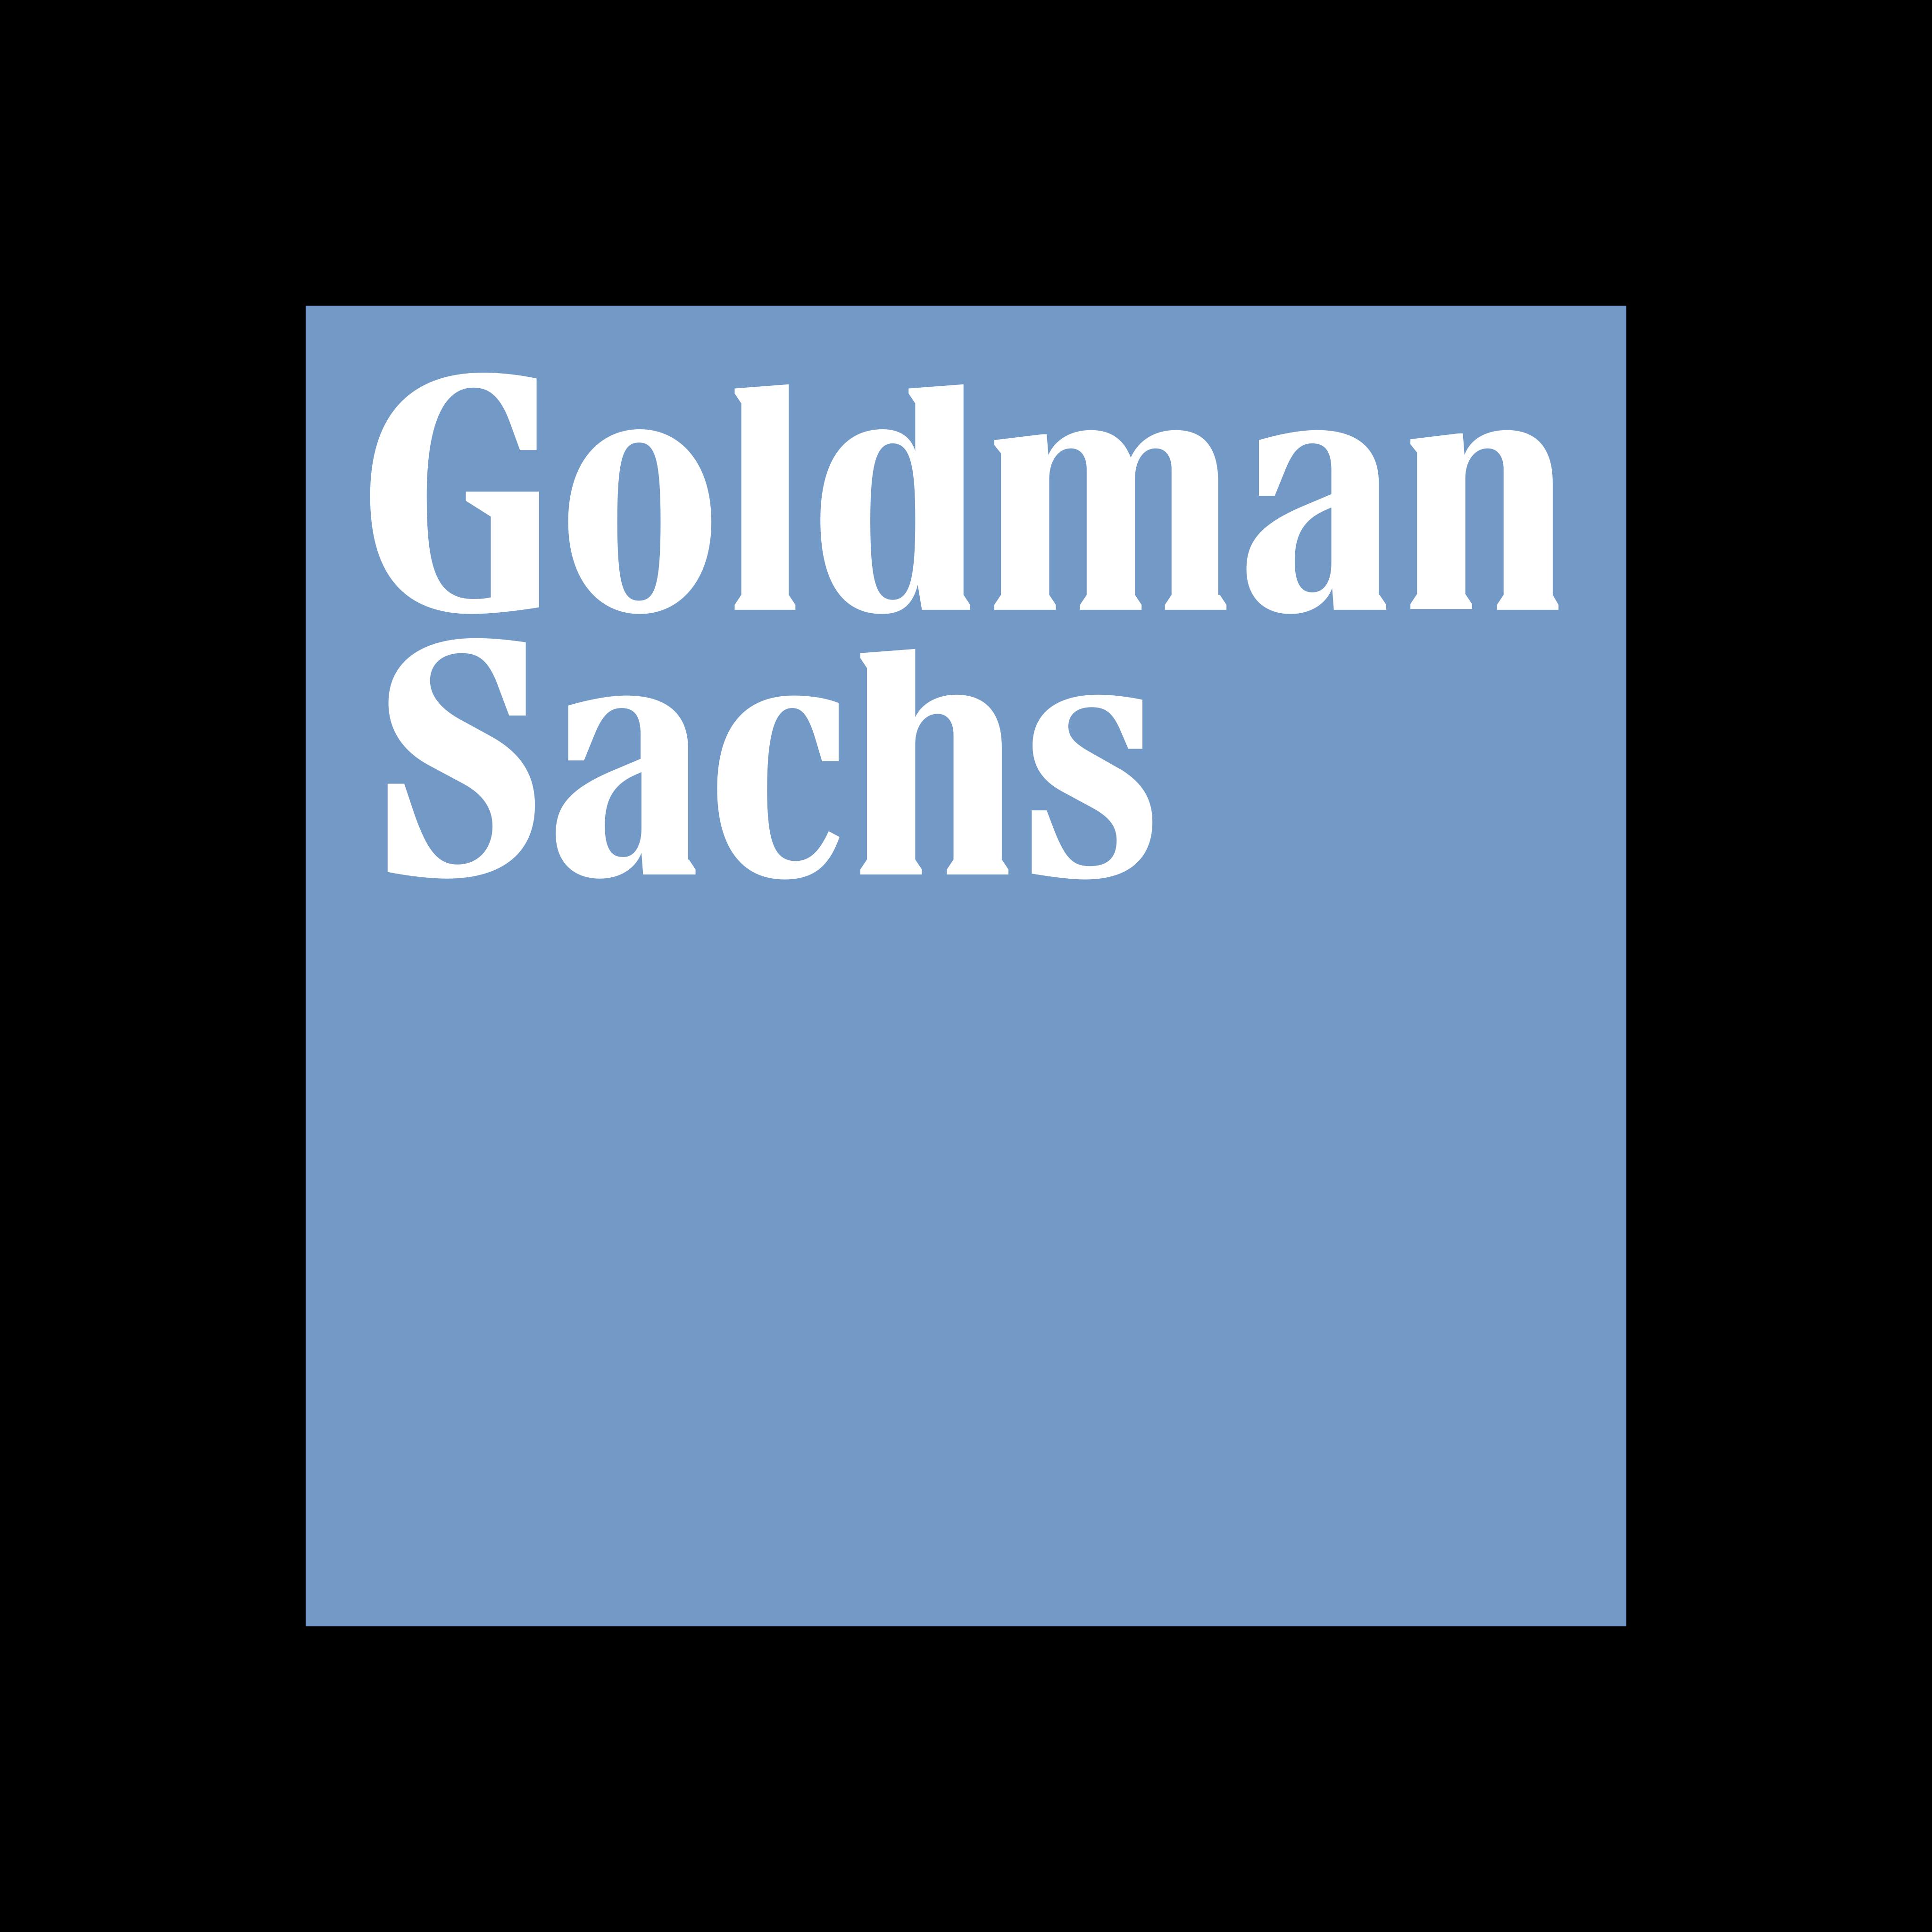 goldman sachs logo 0 - Goldman Sachs Logo